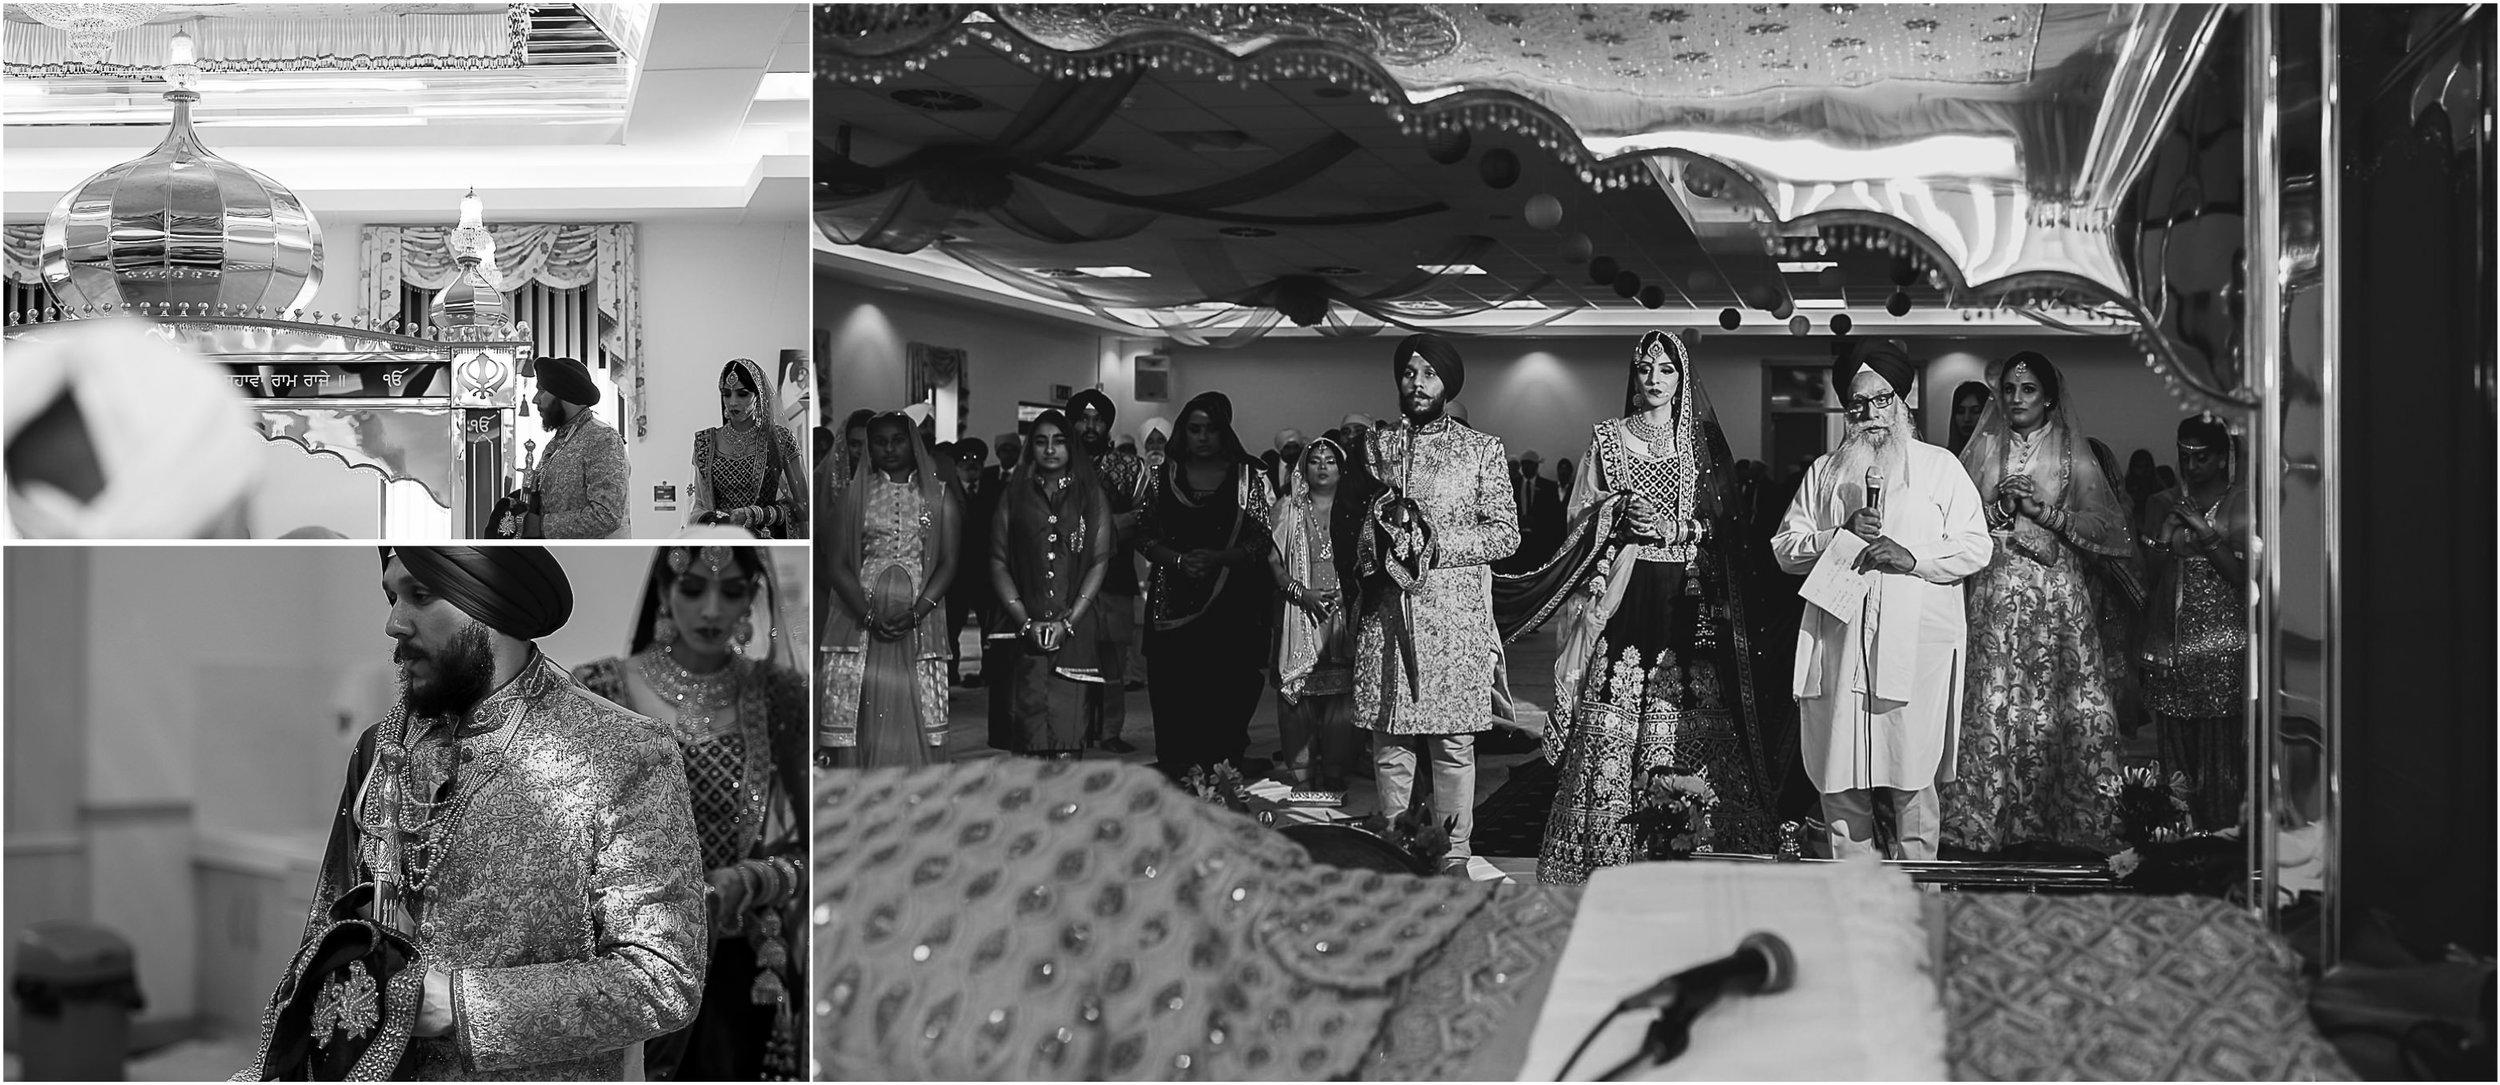 Sikh wedding Photography Wednesfield Gurdwara by SikhandDread 04